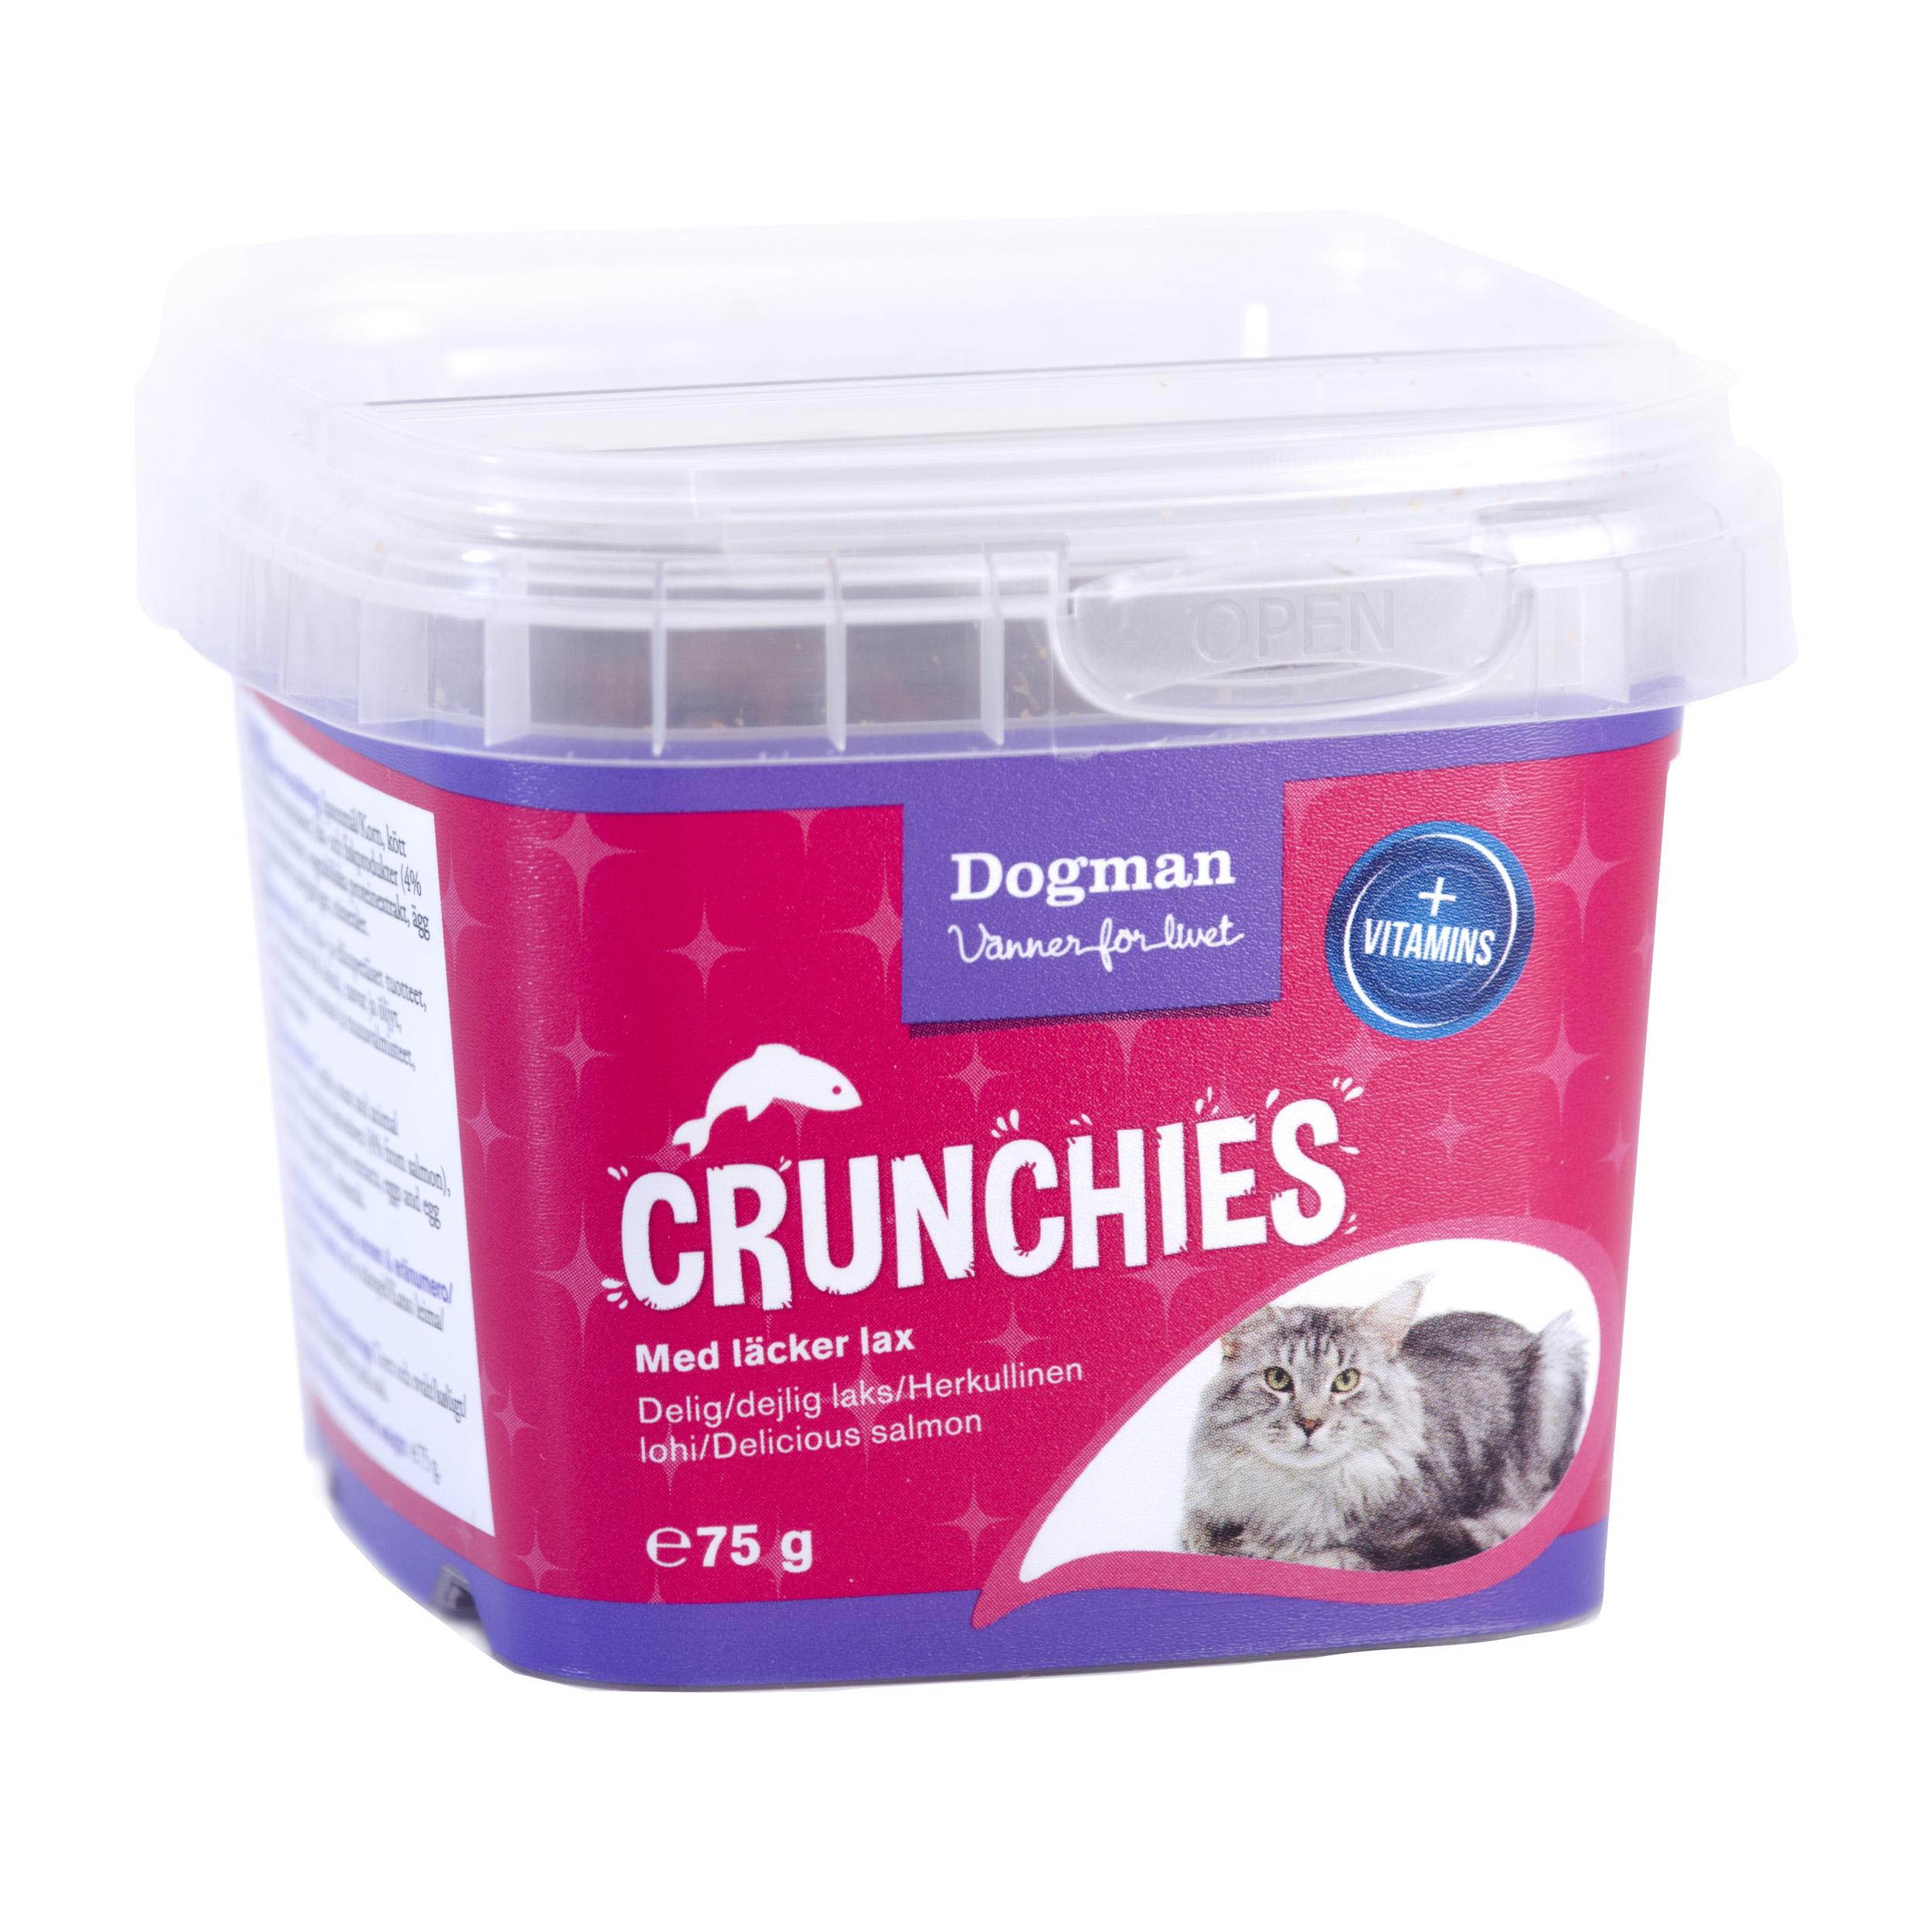 Dogman Crunchies lax 75g